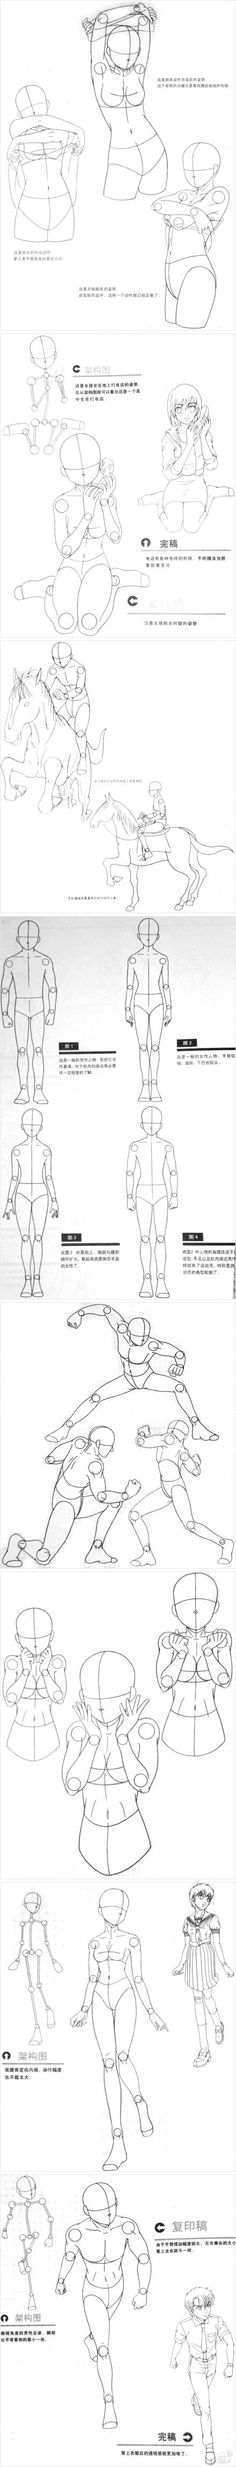 http://www.duitang.com/people/mblog/110598455/detail/